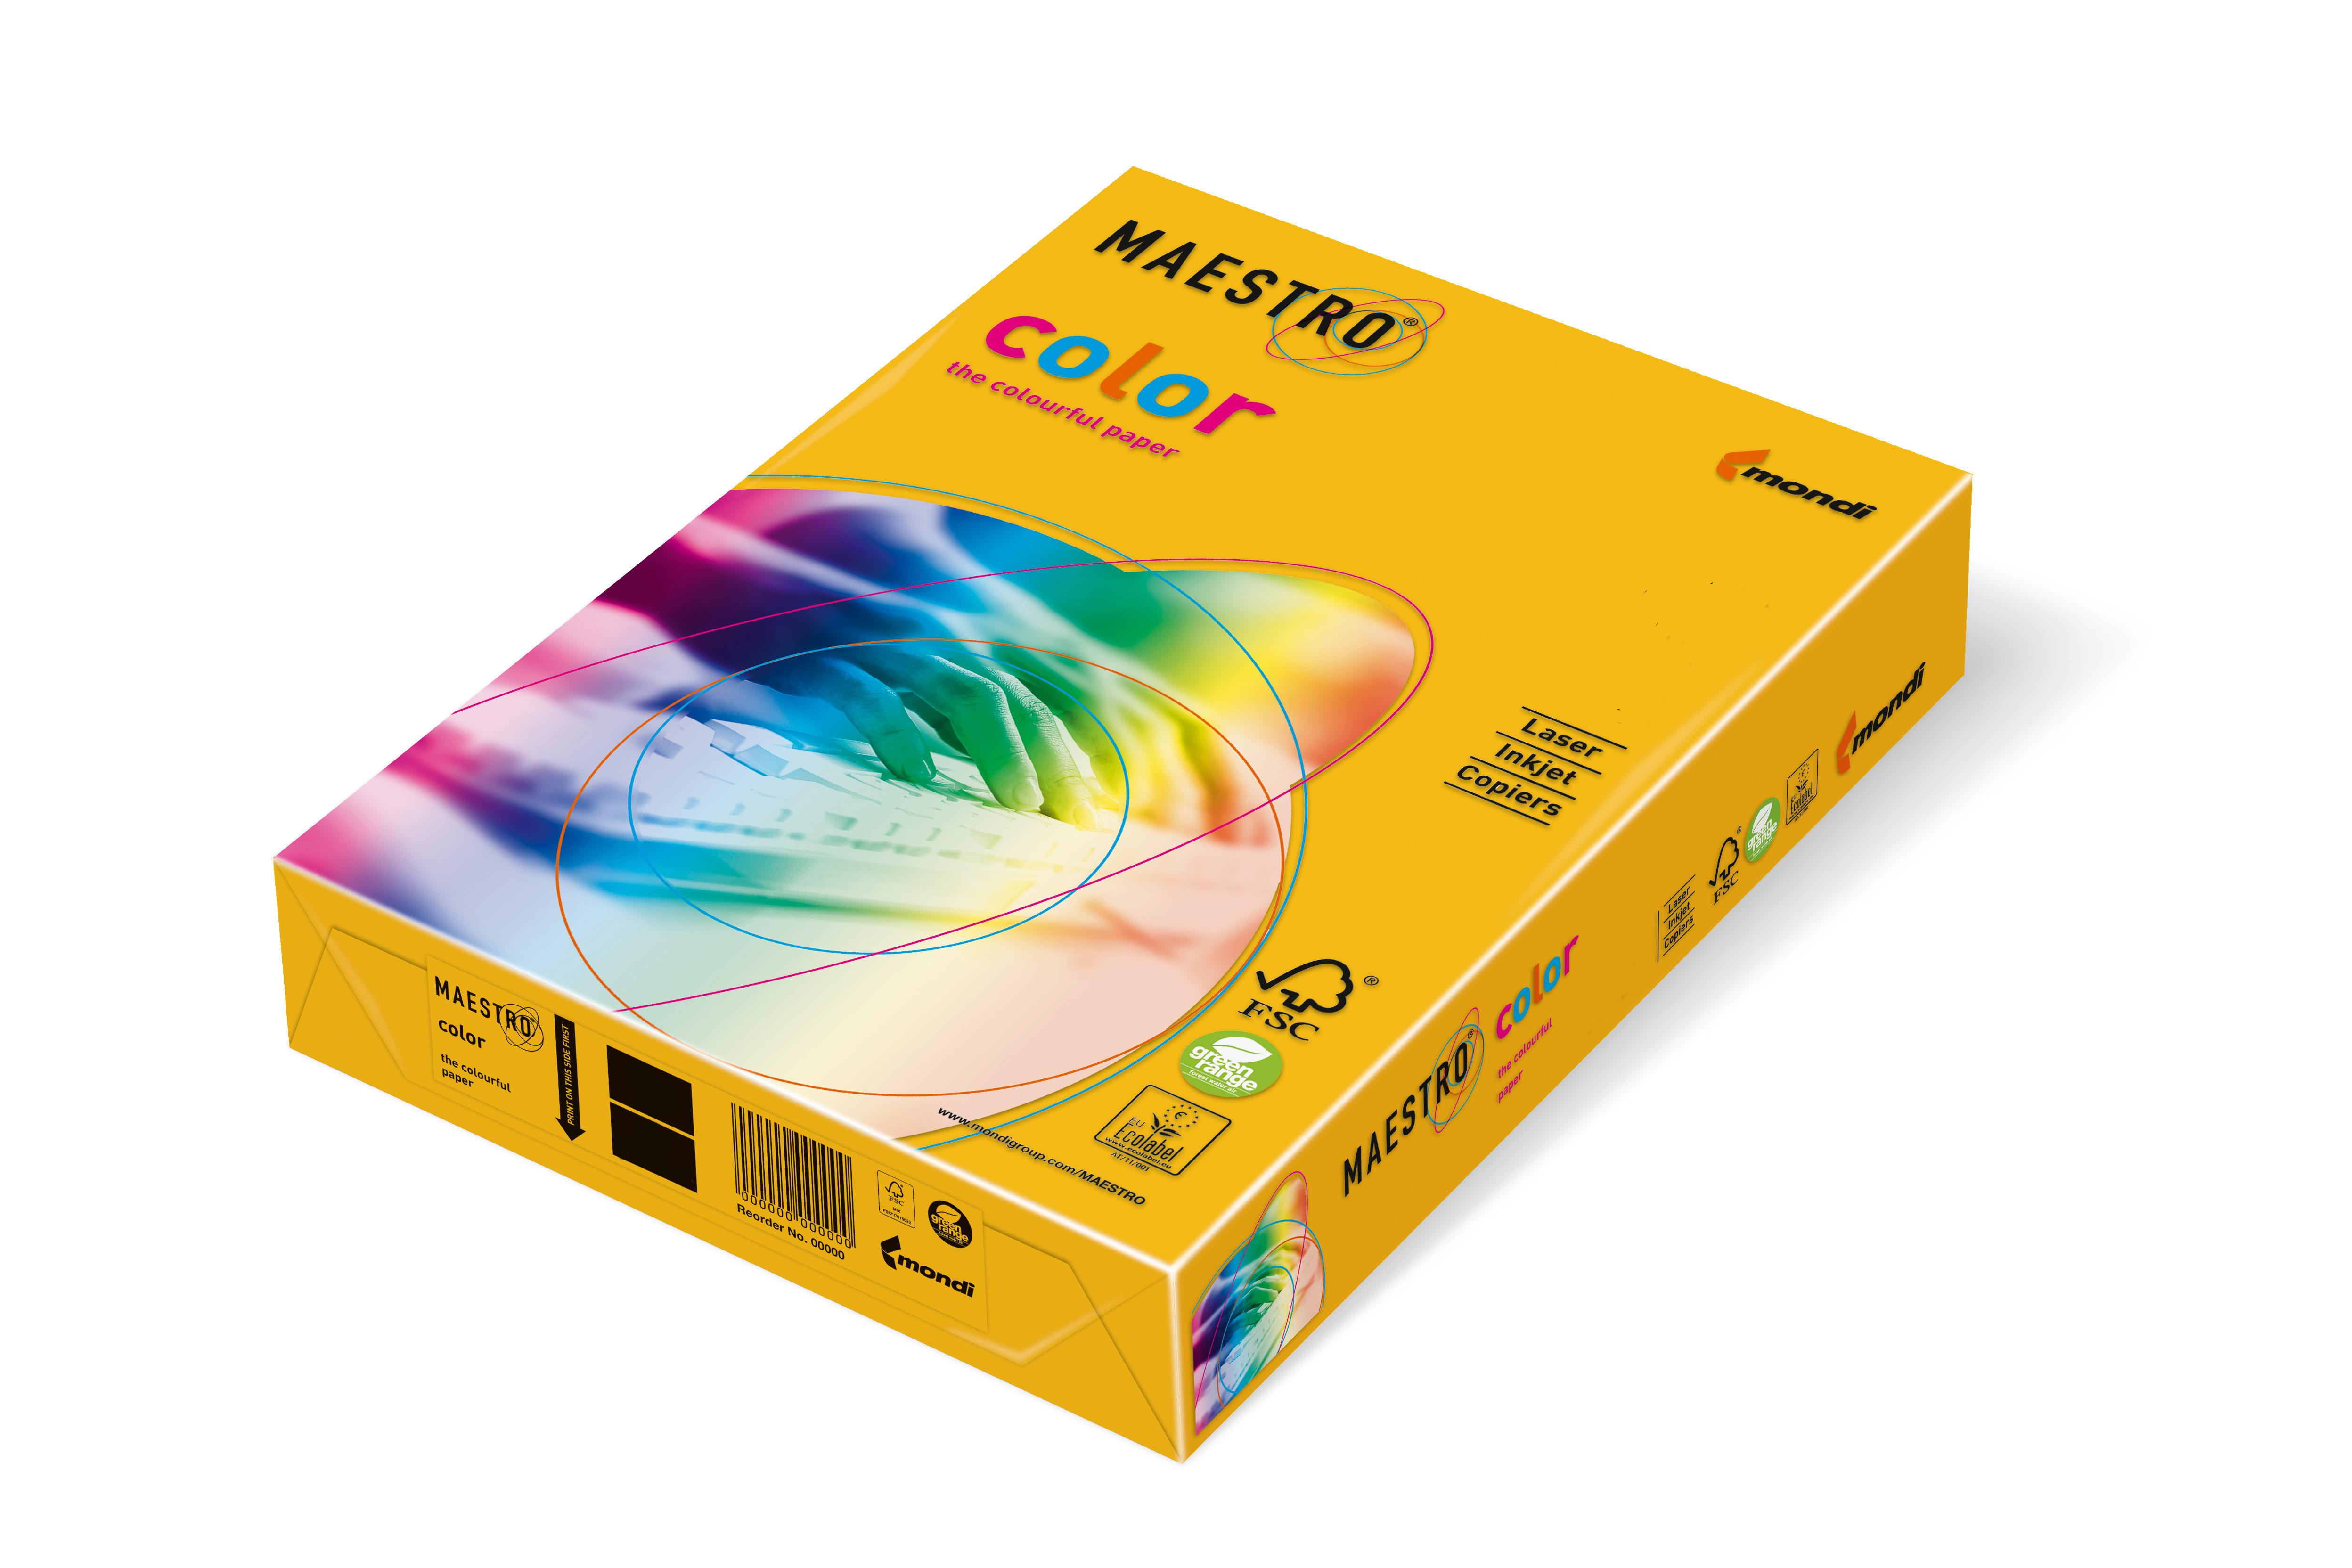 Vorschau: Mondi Maestro Color sonnengelb 120g/m² DIN-A4 - 250 Blatt SY40